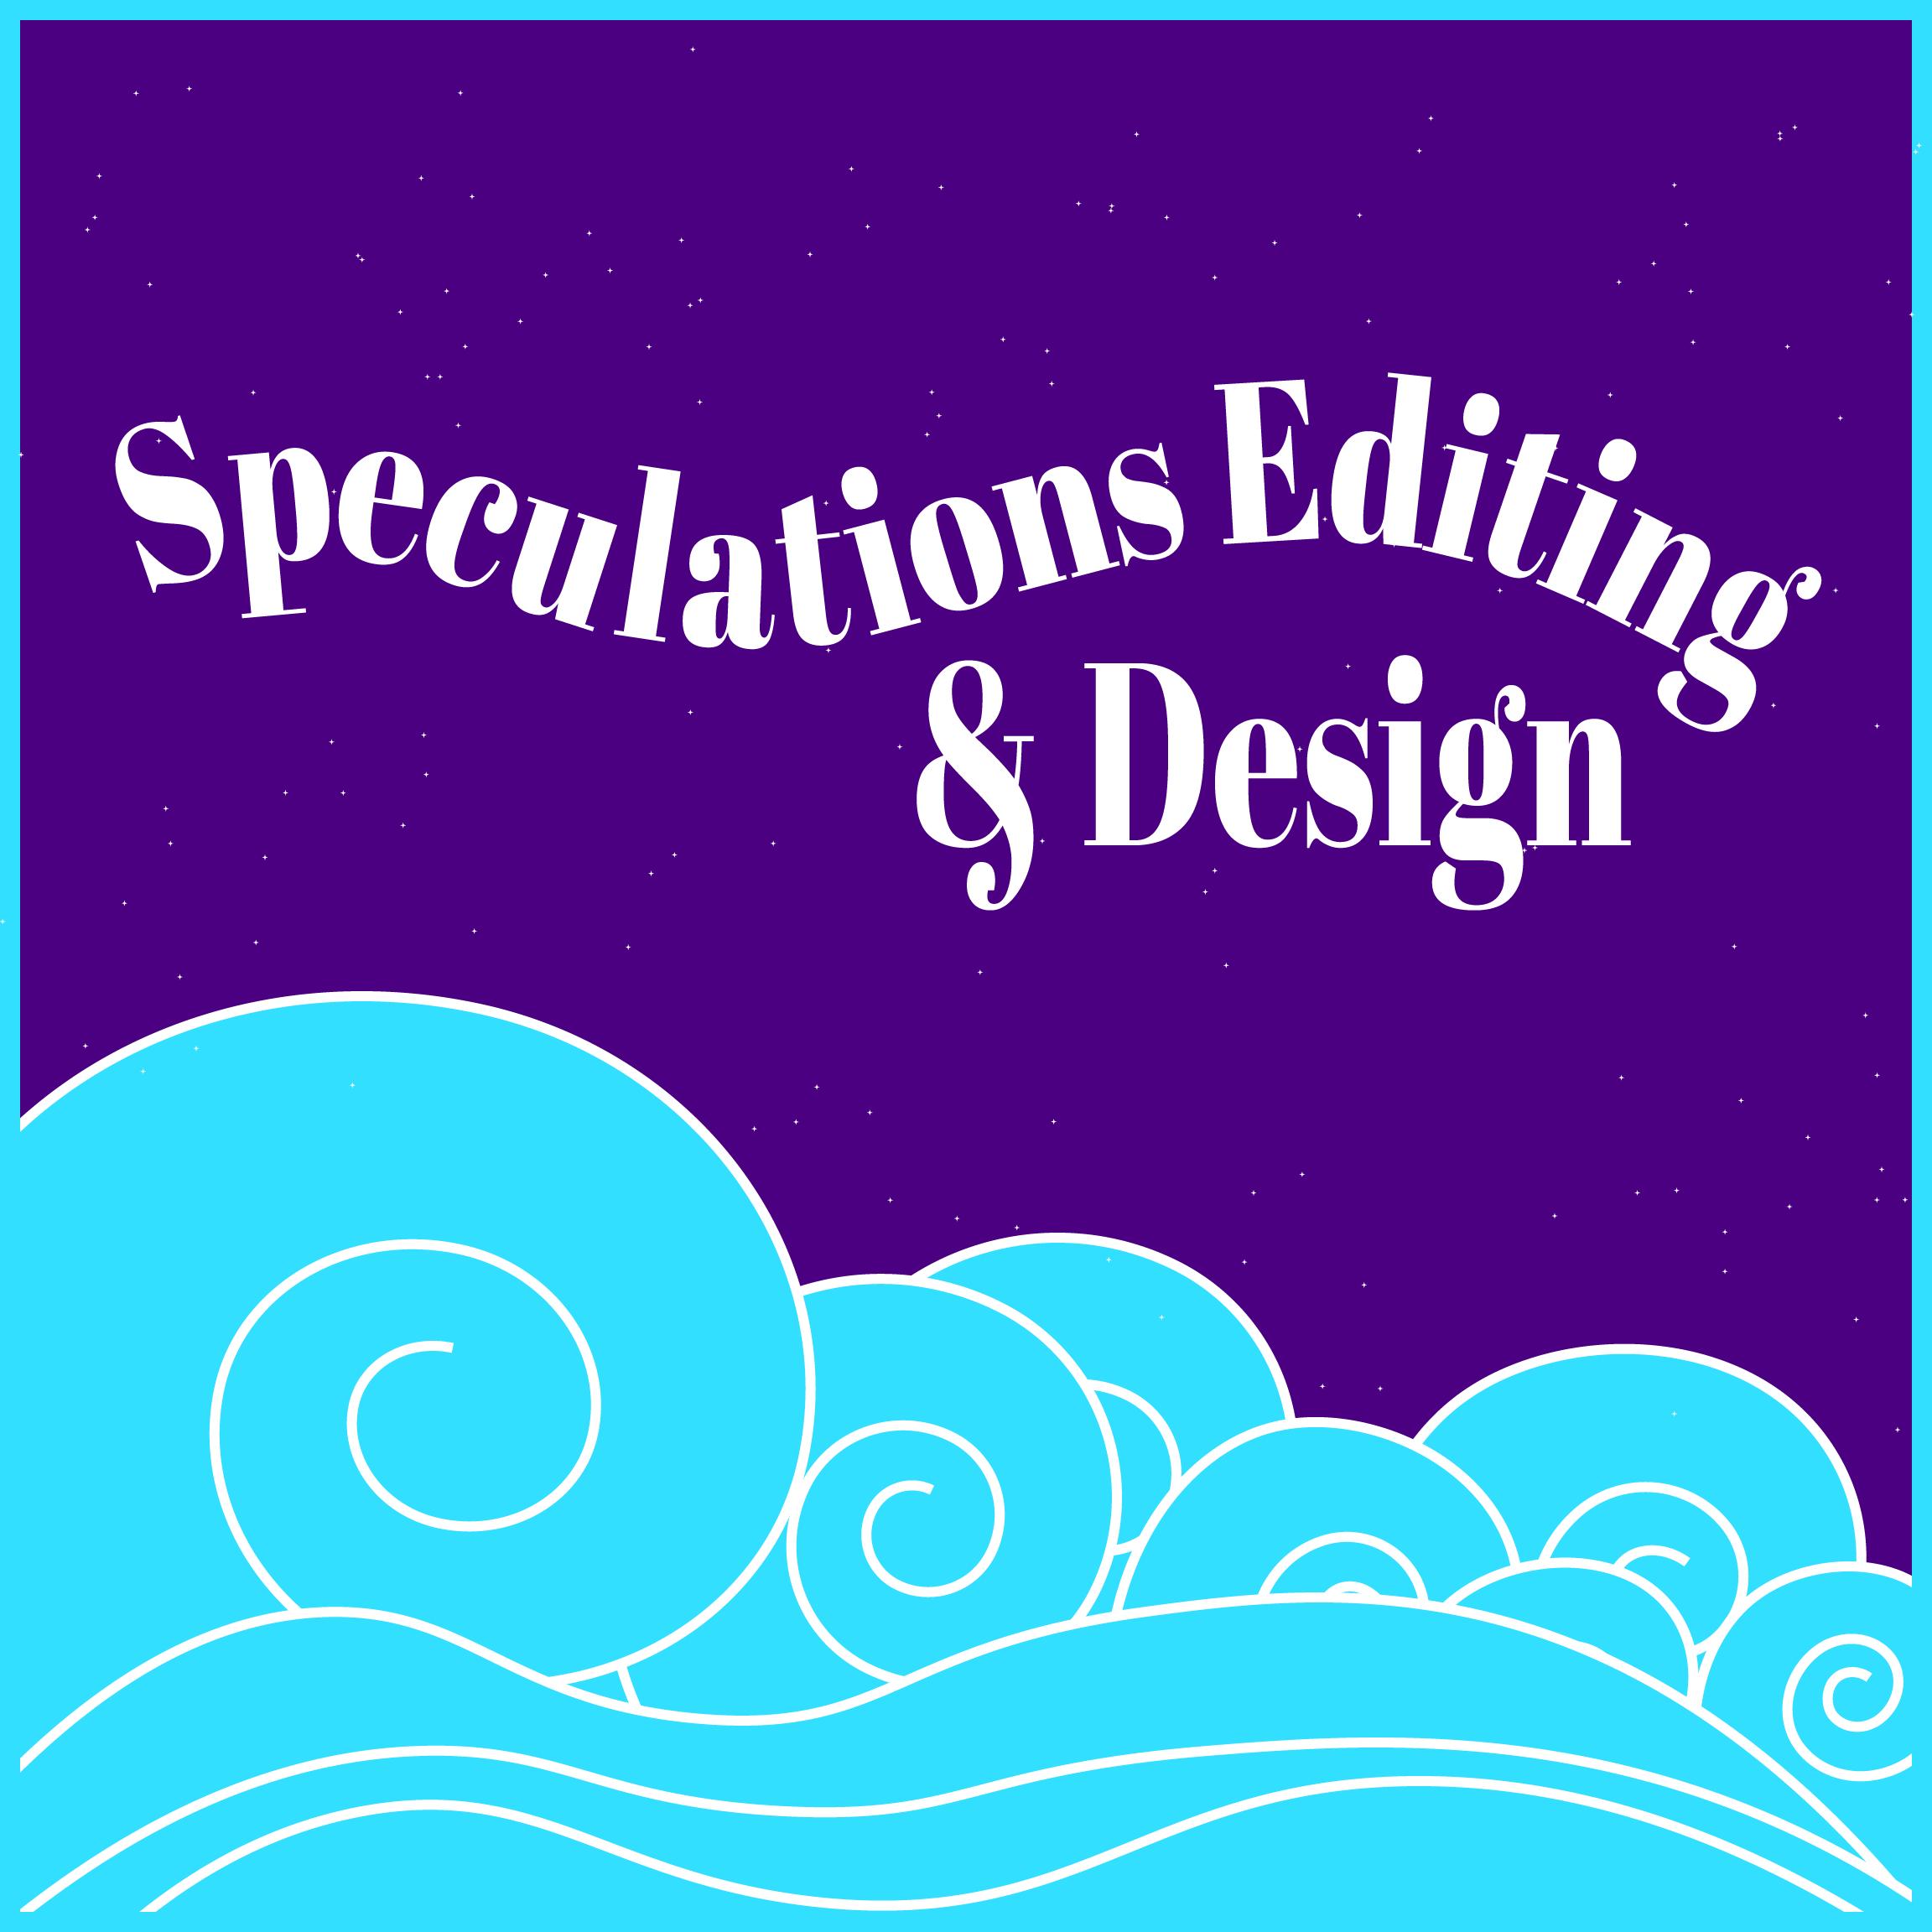 Speculations Editing